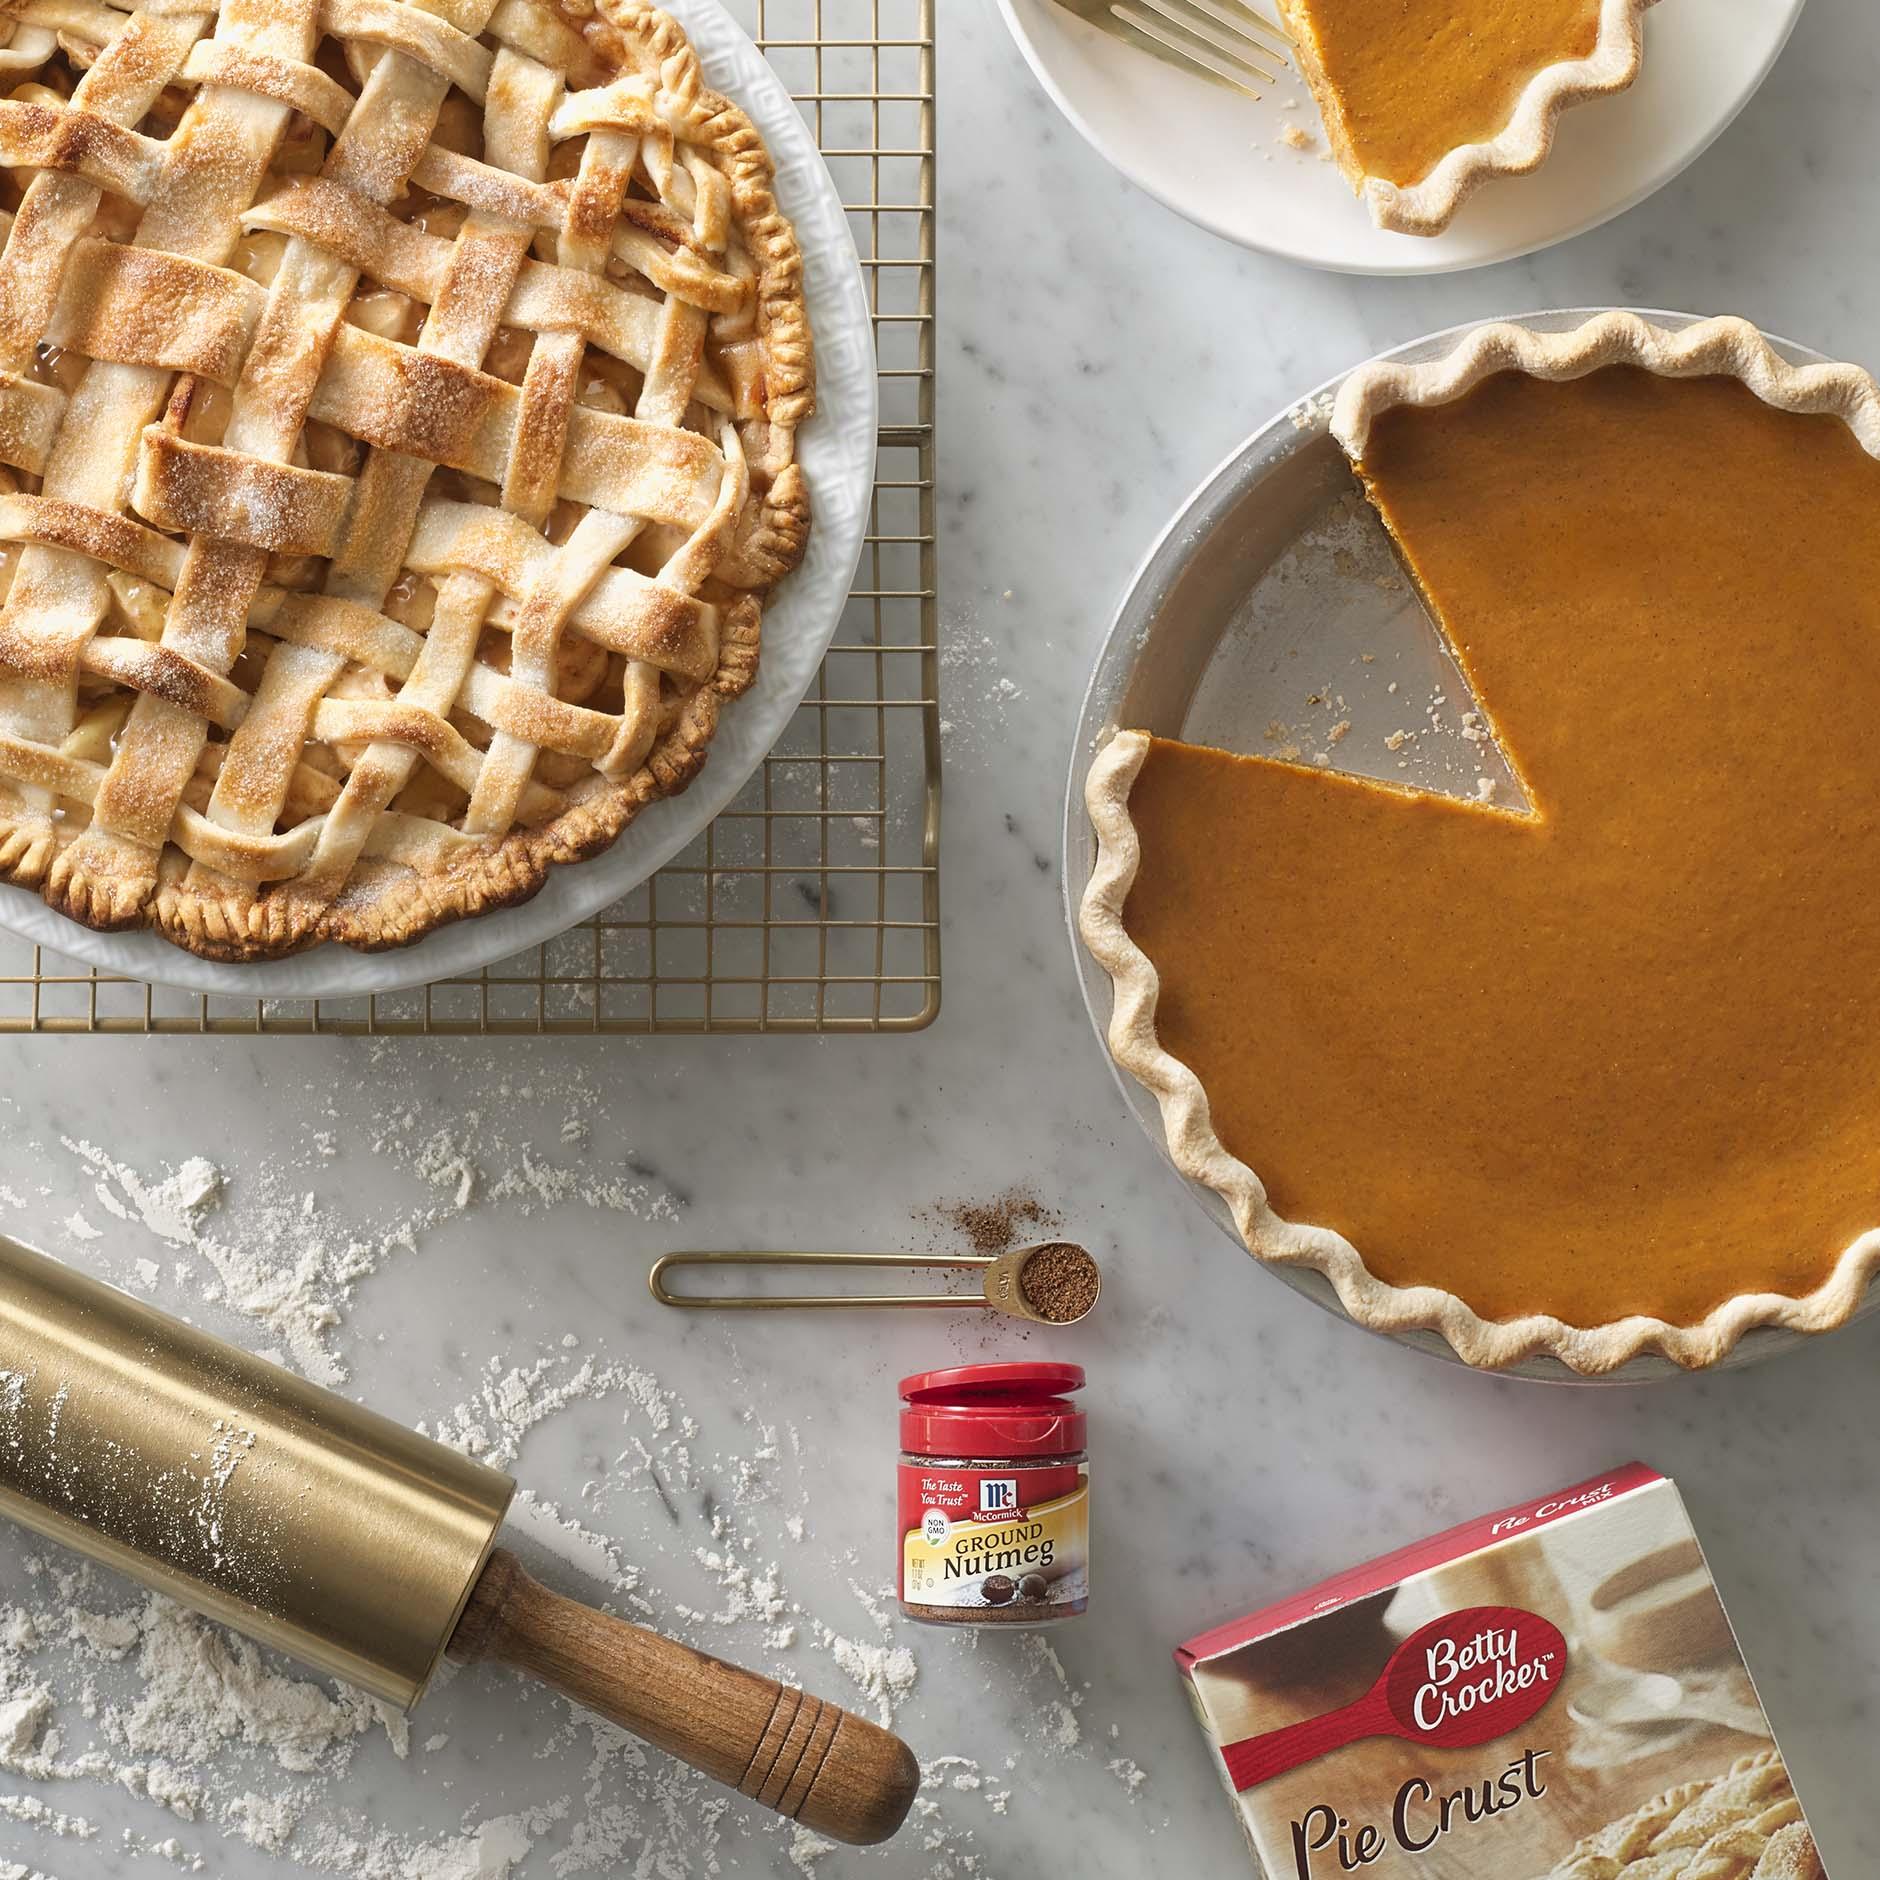 C-000653-01-020_HPBG_Thanksgiving_Tag_11wk4_Storyblock_Pie.jpg